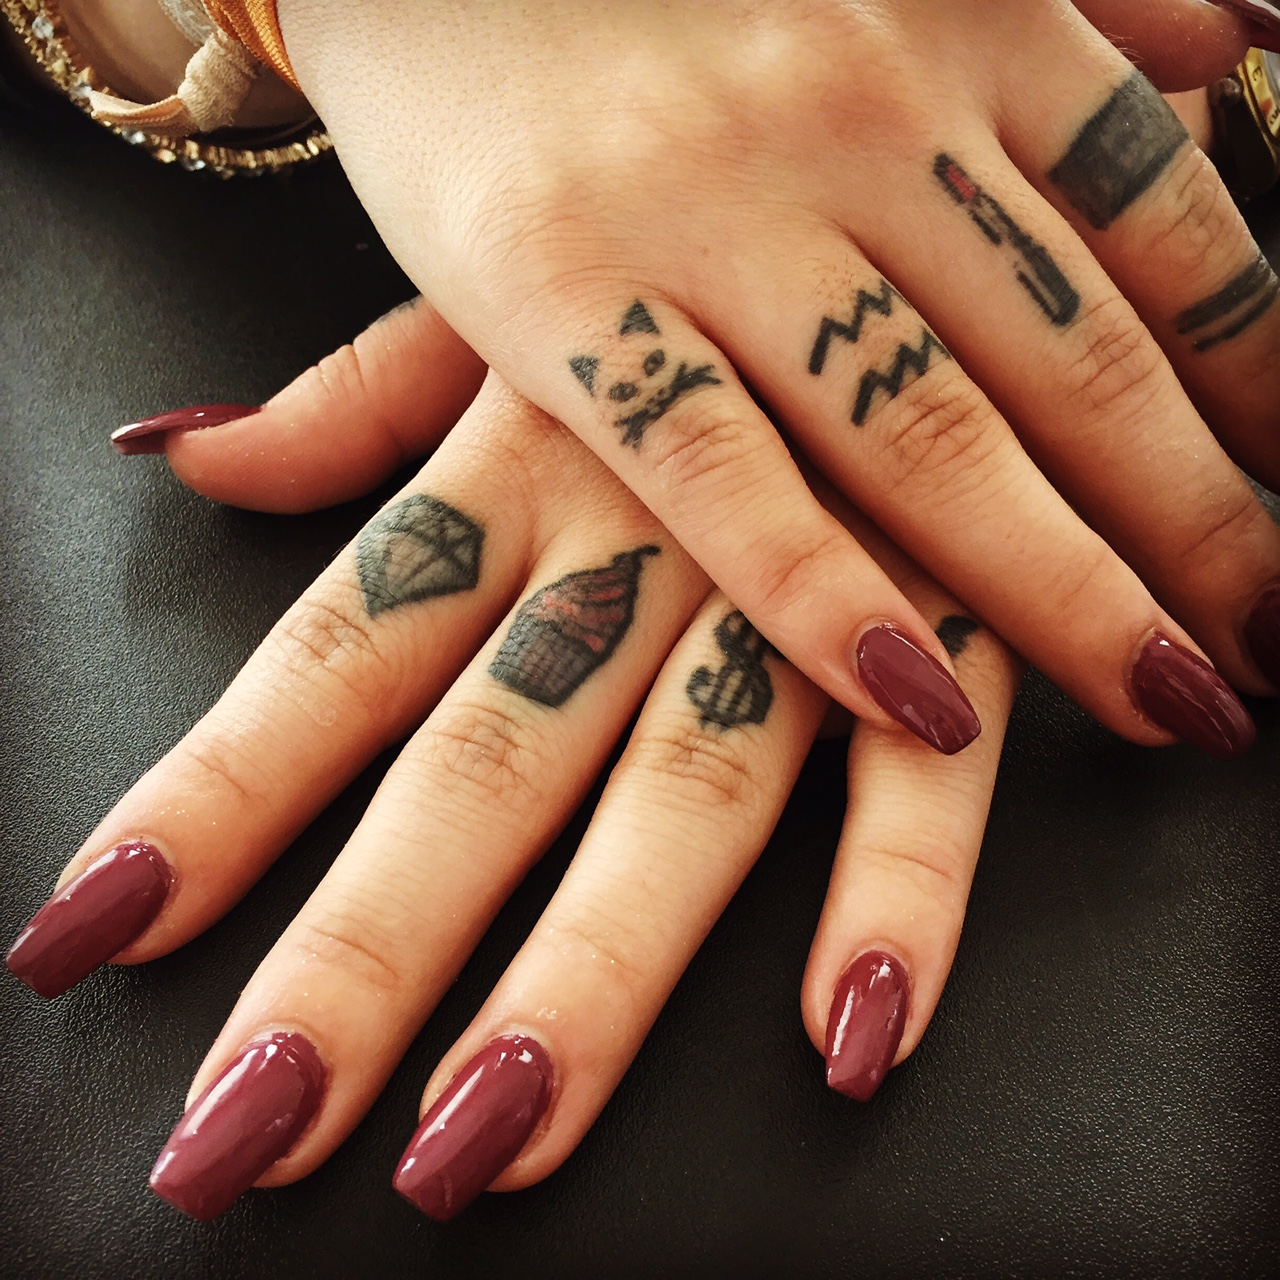 nails 20.jpg